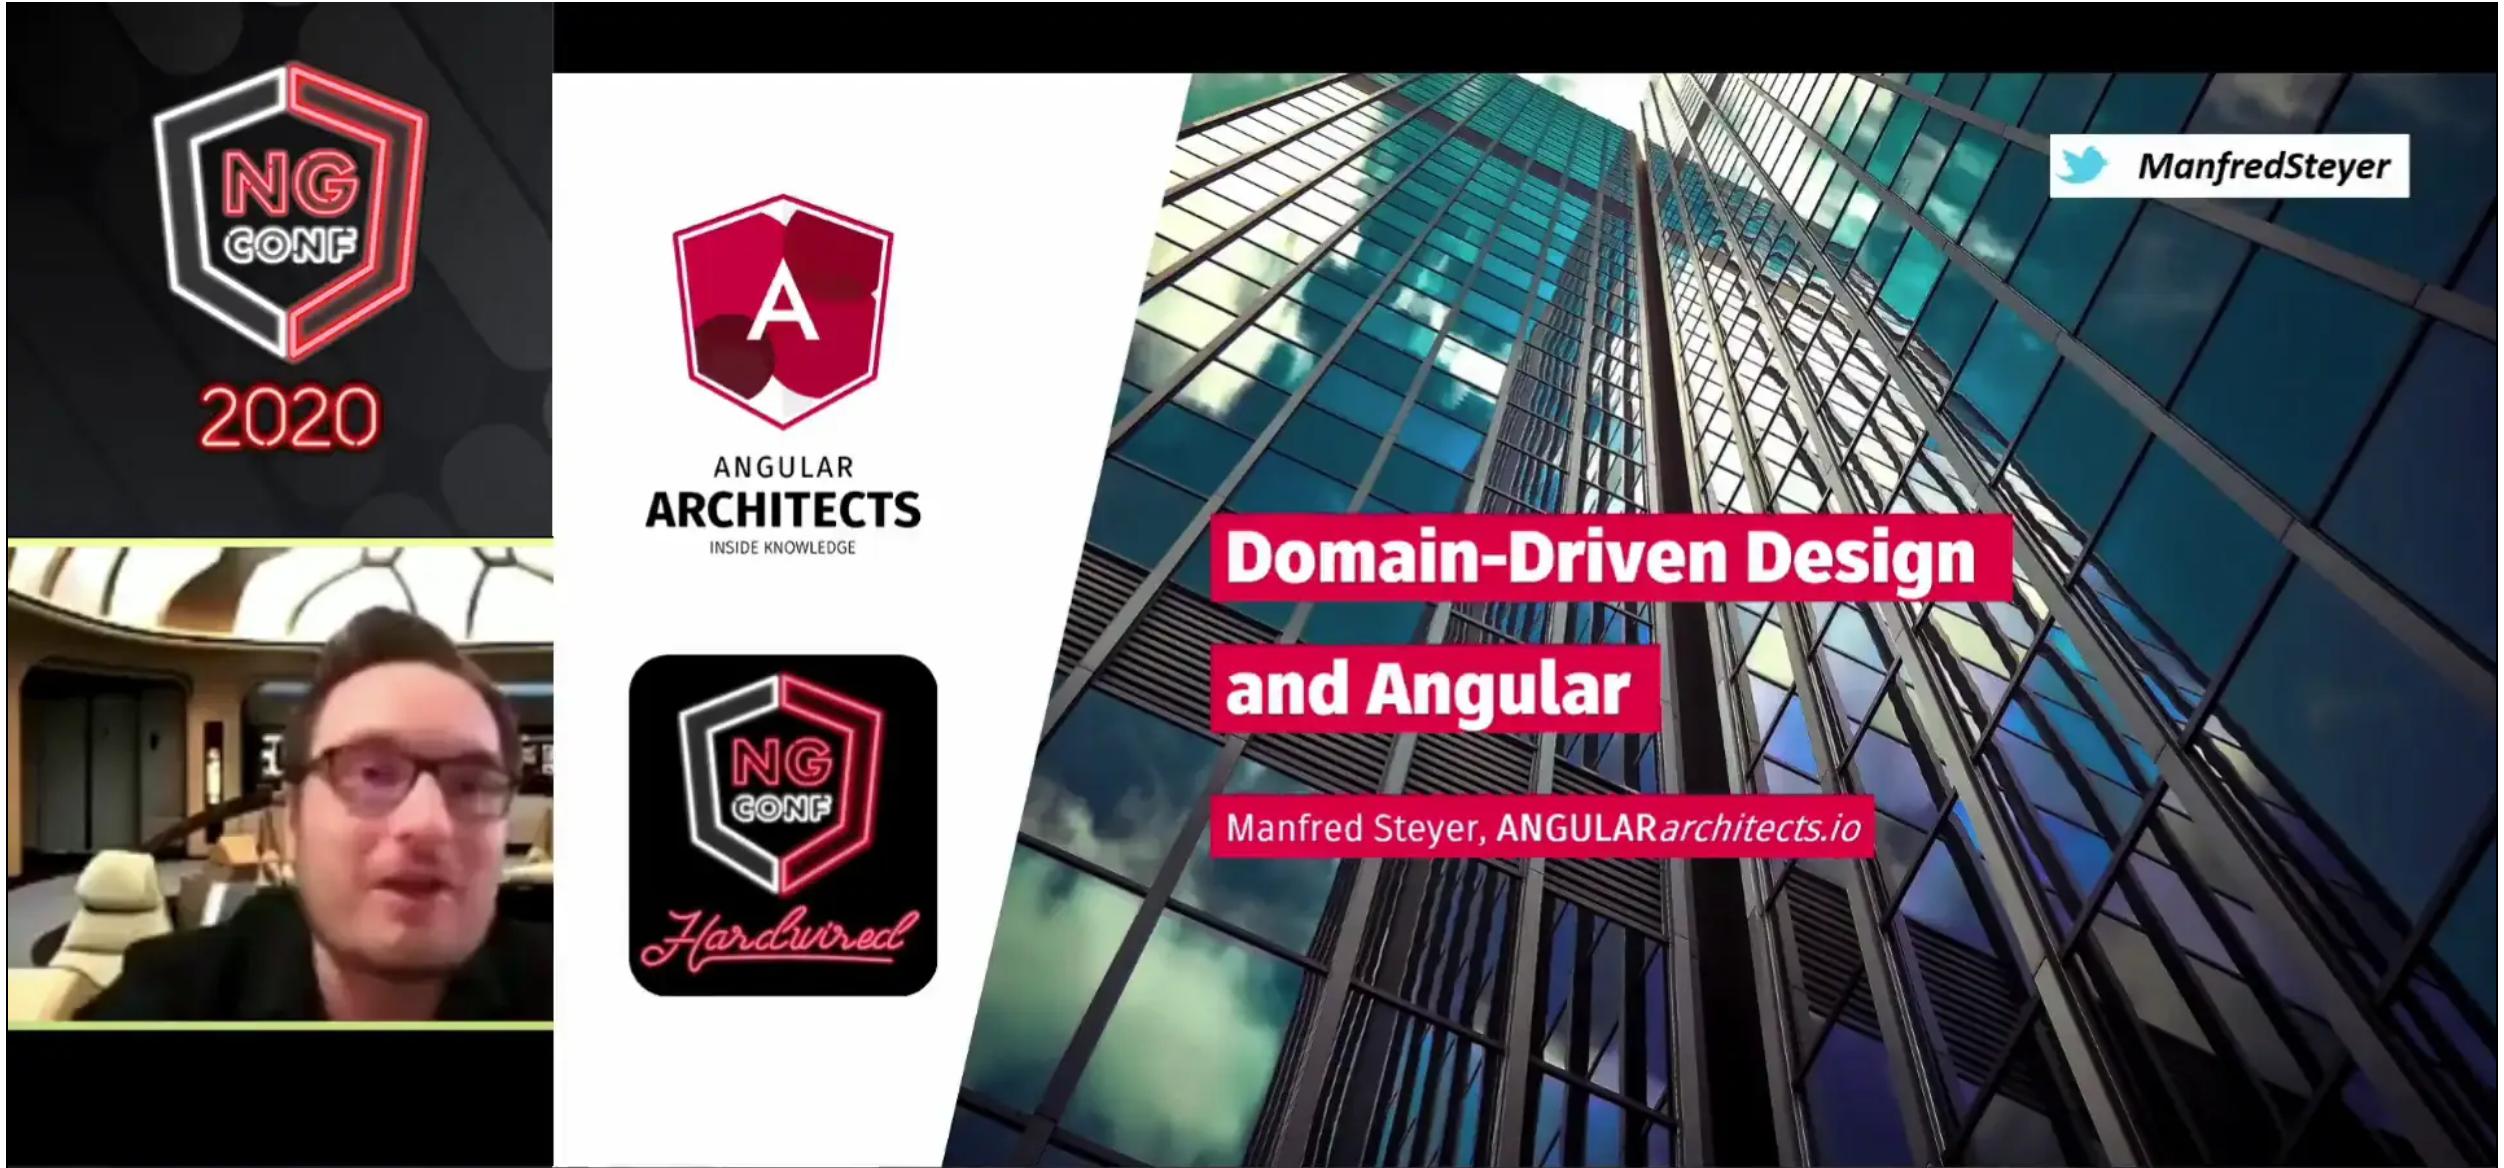 Domain-Driven Design and Angular